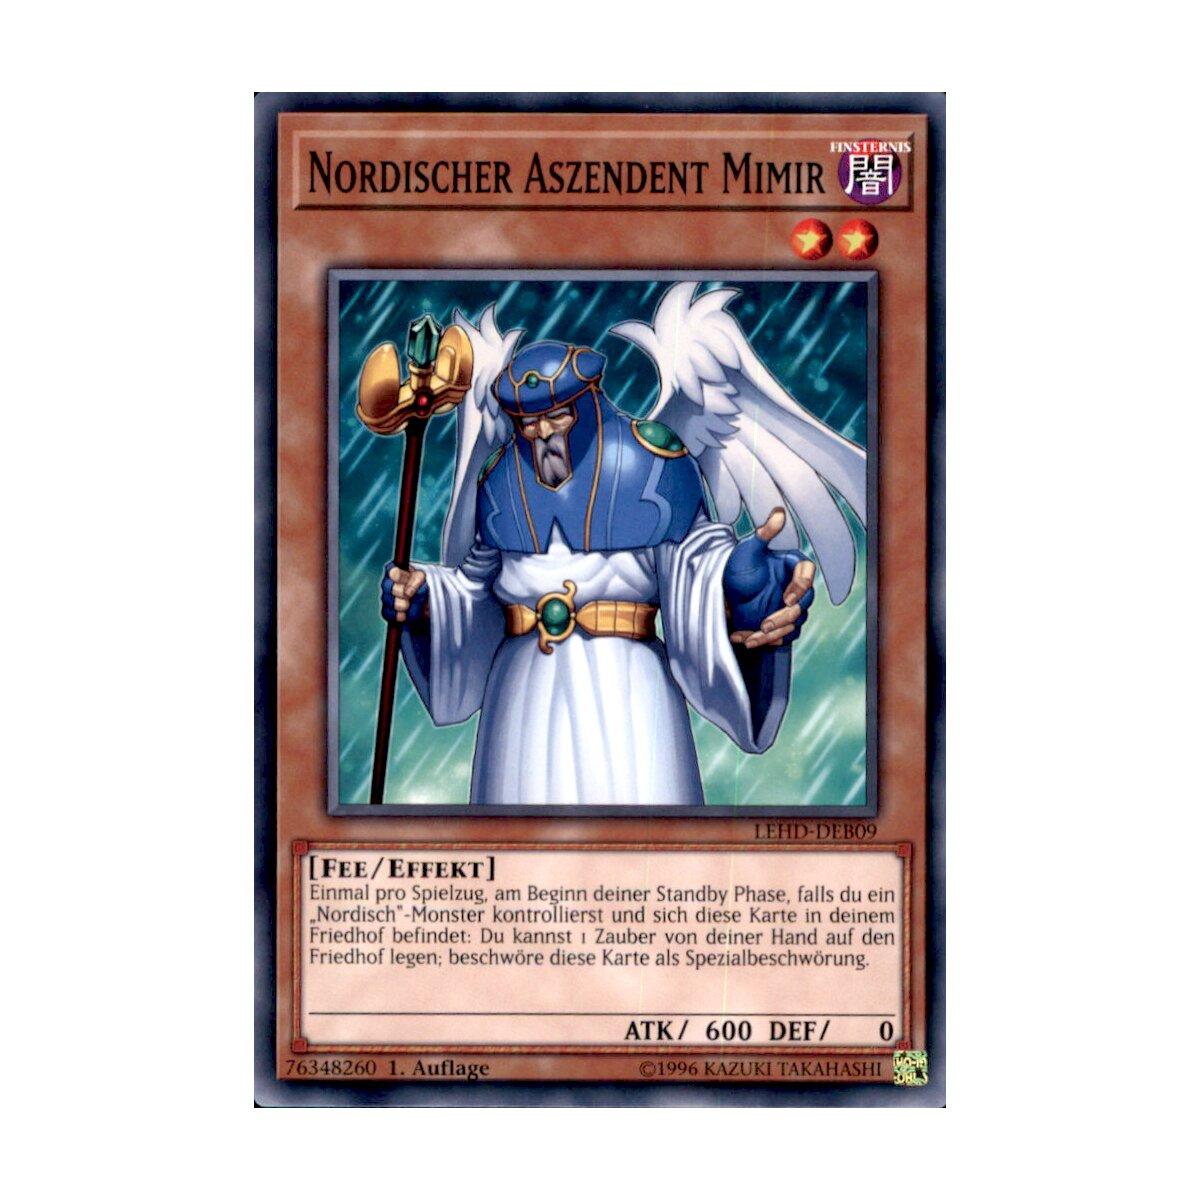 Yu-Gi-Oh! Einzelkarten Sammelkartenspiele/TCGs LEHD-DEA29 Ewige Furcht   Common 1.Auflage  Neu